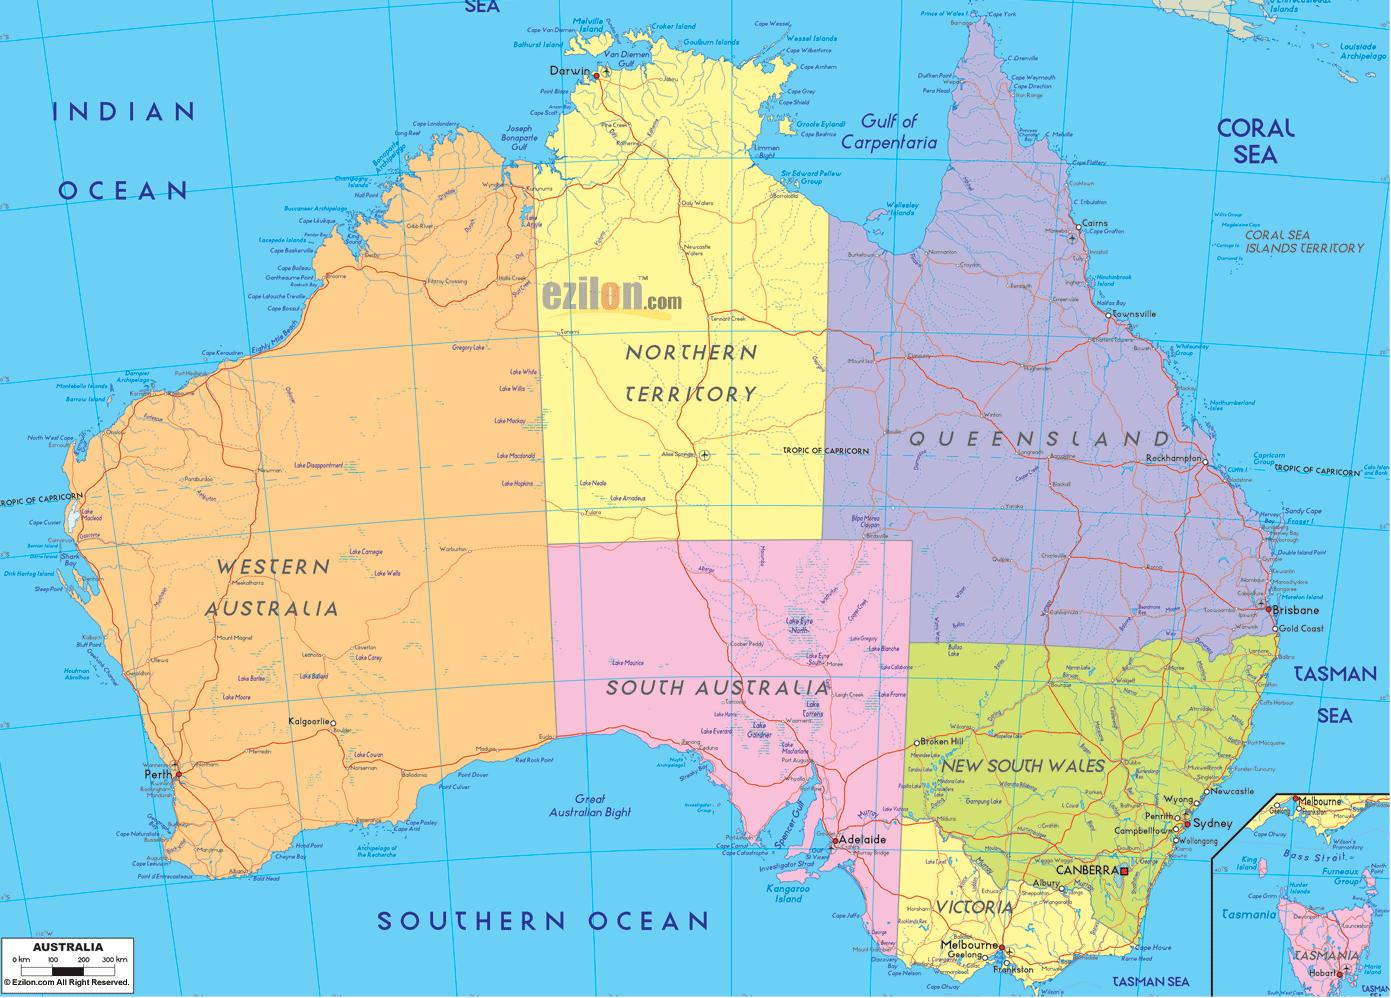 kart over australia Australia kart hd   Kart over Australia hd (Australia og New  kart over australia